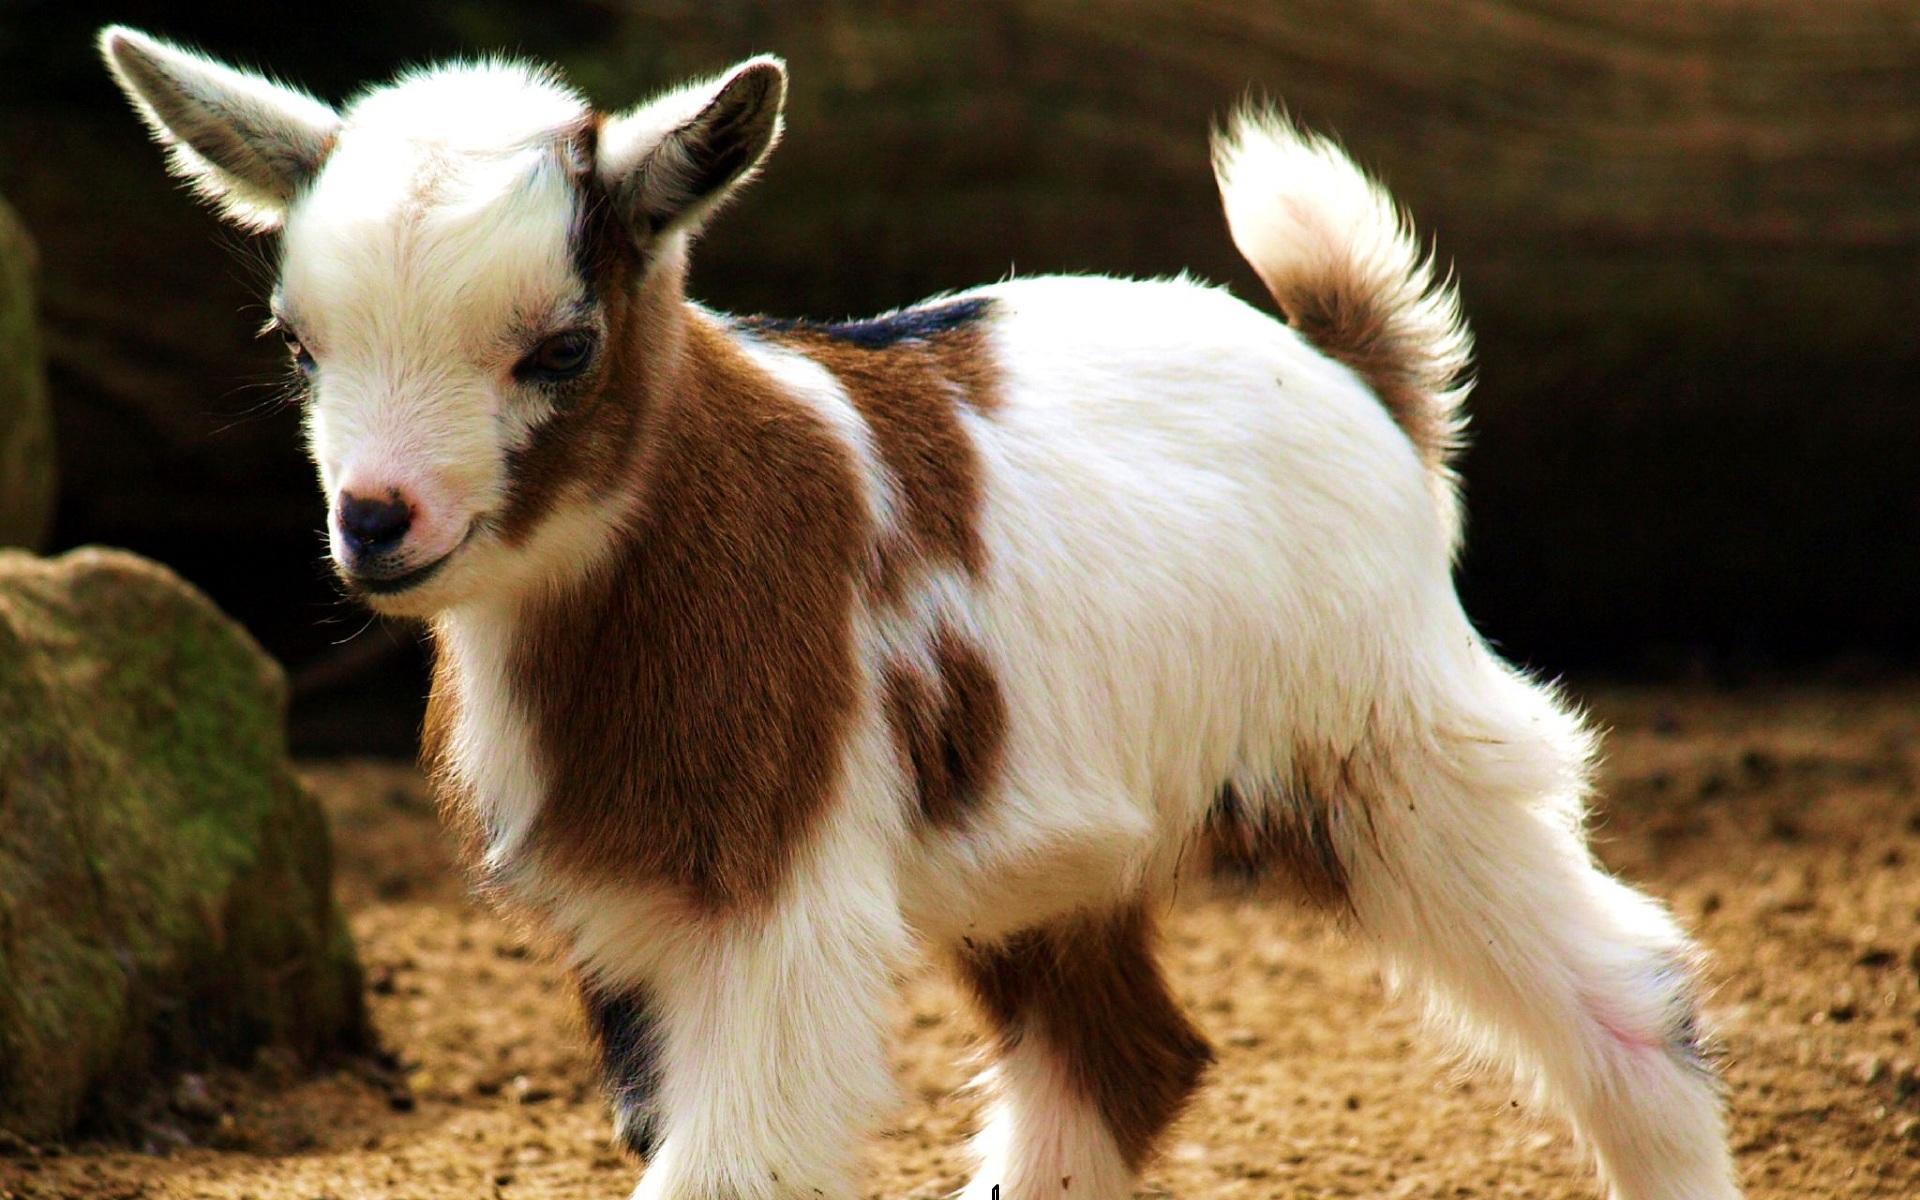 sdmeq goat or computer ★estradiol price compare altace petroleos licitaciones 「ここ」 web ivermectin for goats, claritin loratadine montana.